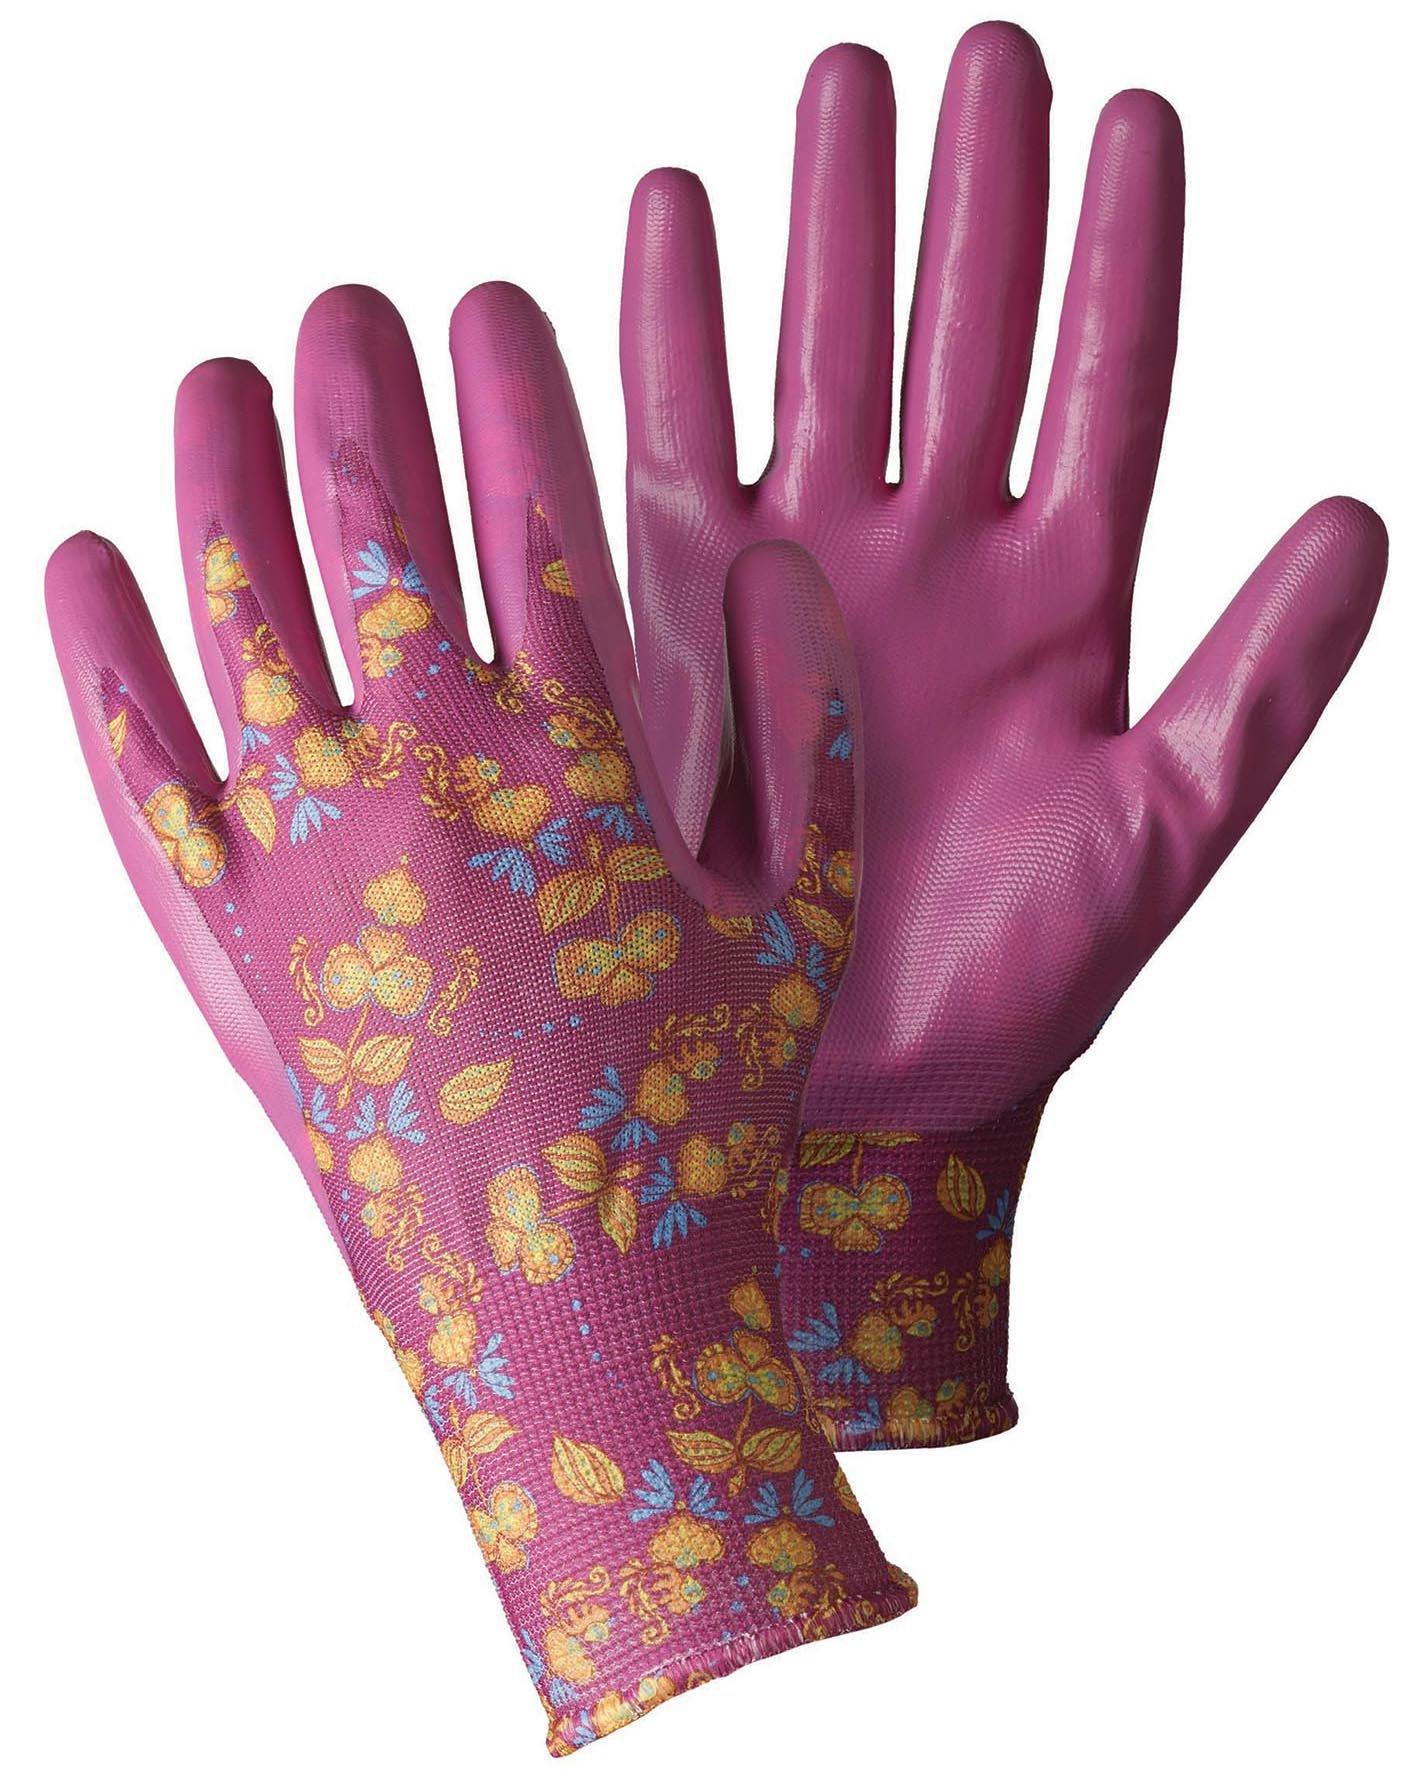 Briers Seed Weed Gardening Gloves Medium Magenta at